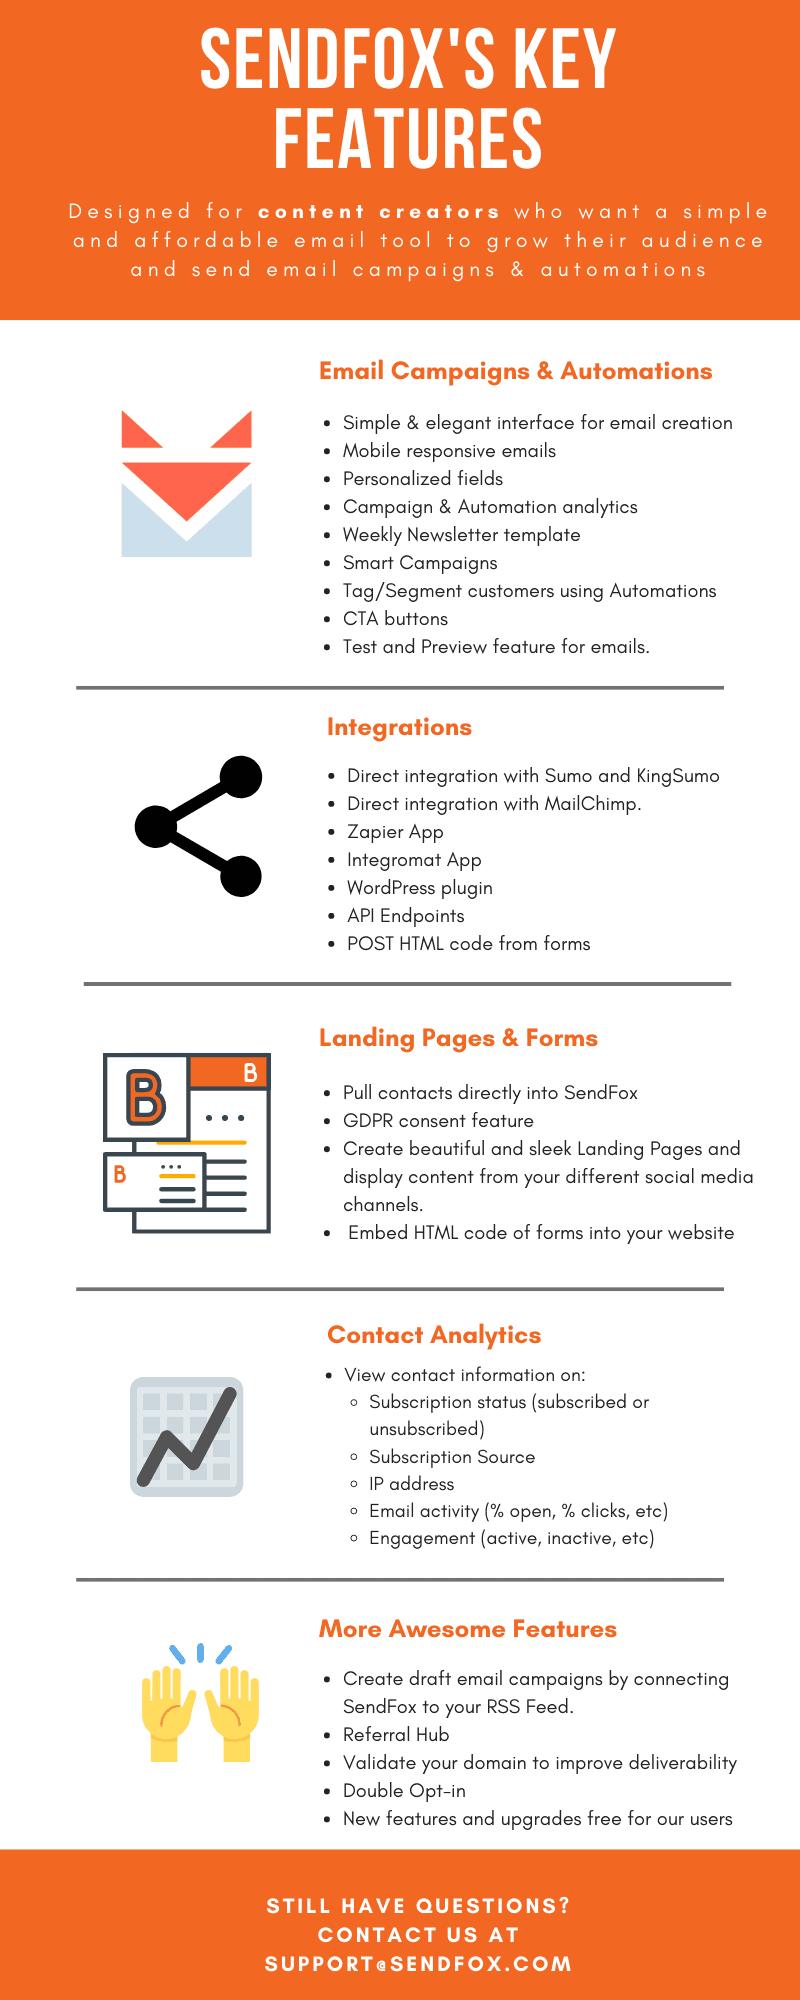 sendfox infographic